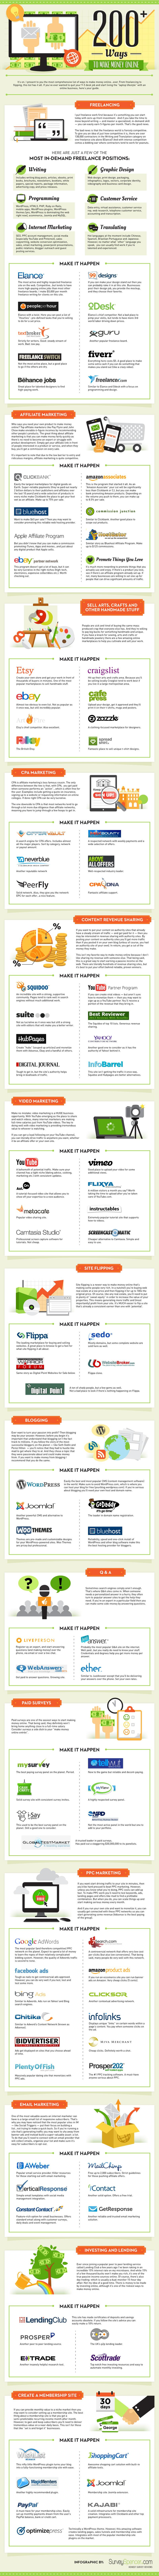 make_money_online_infographic-new